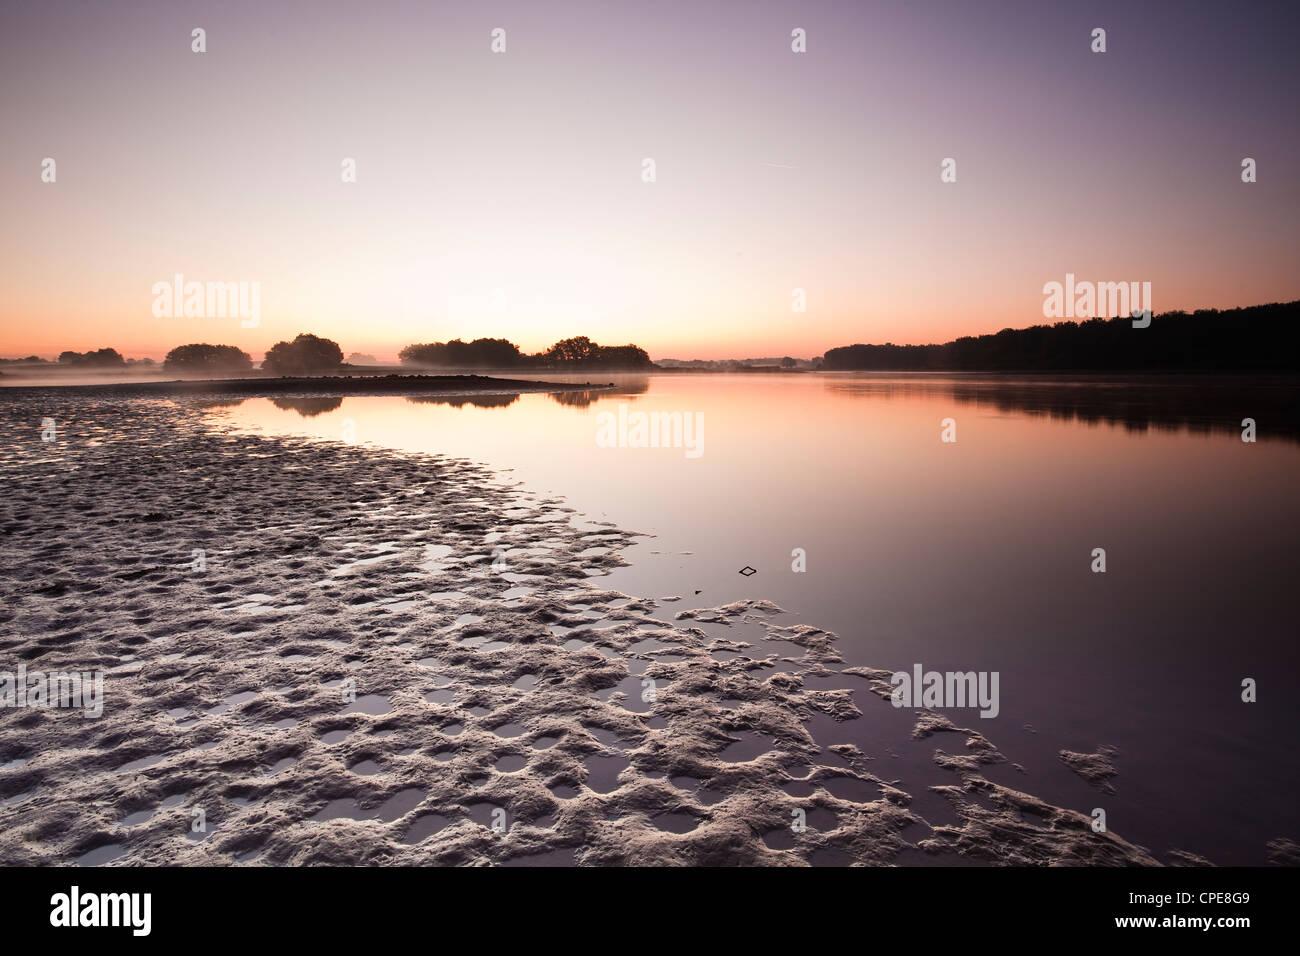 A pond (etang ) in the natural park of La Brenne (Pays aux Mille Etangs), Indre, Loire Valley, Centre, France - Stock Image